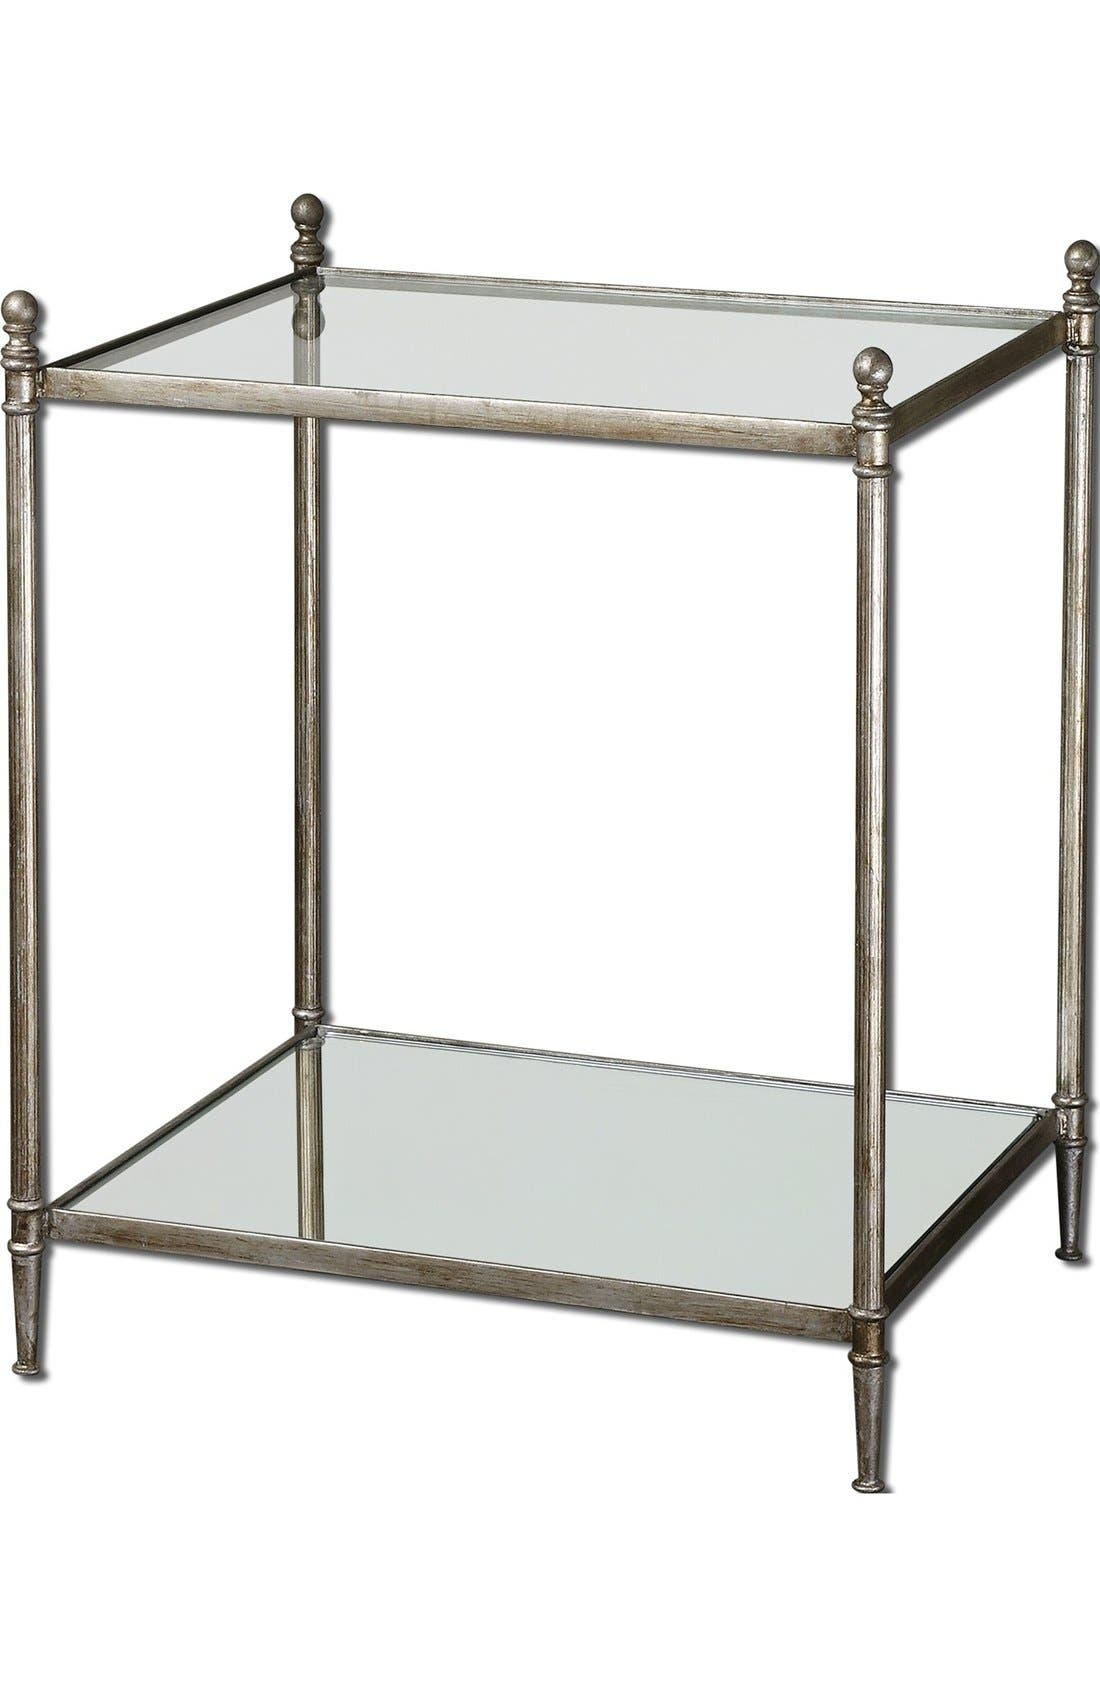 Main Image - Uttermost 'Gannon' Antiqued End Table